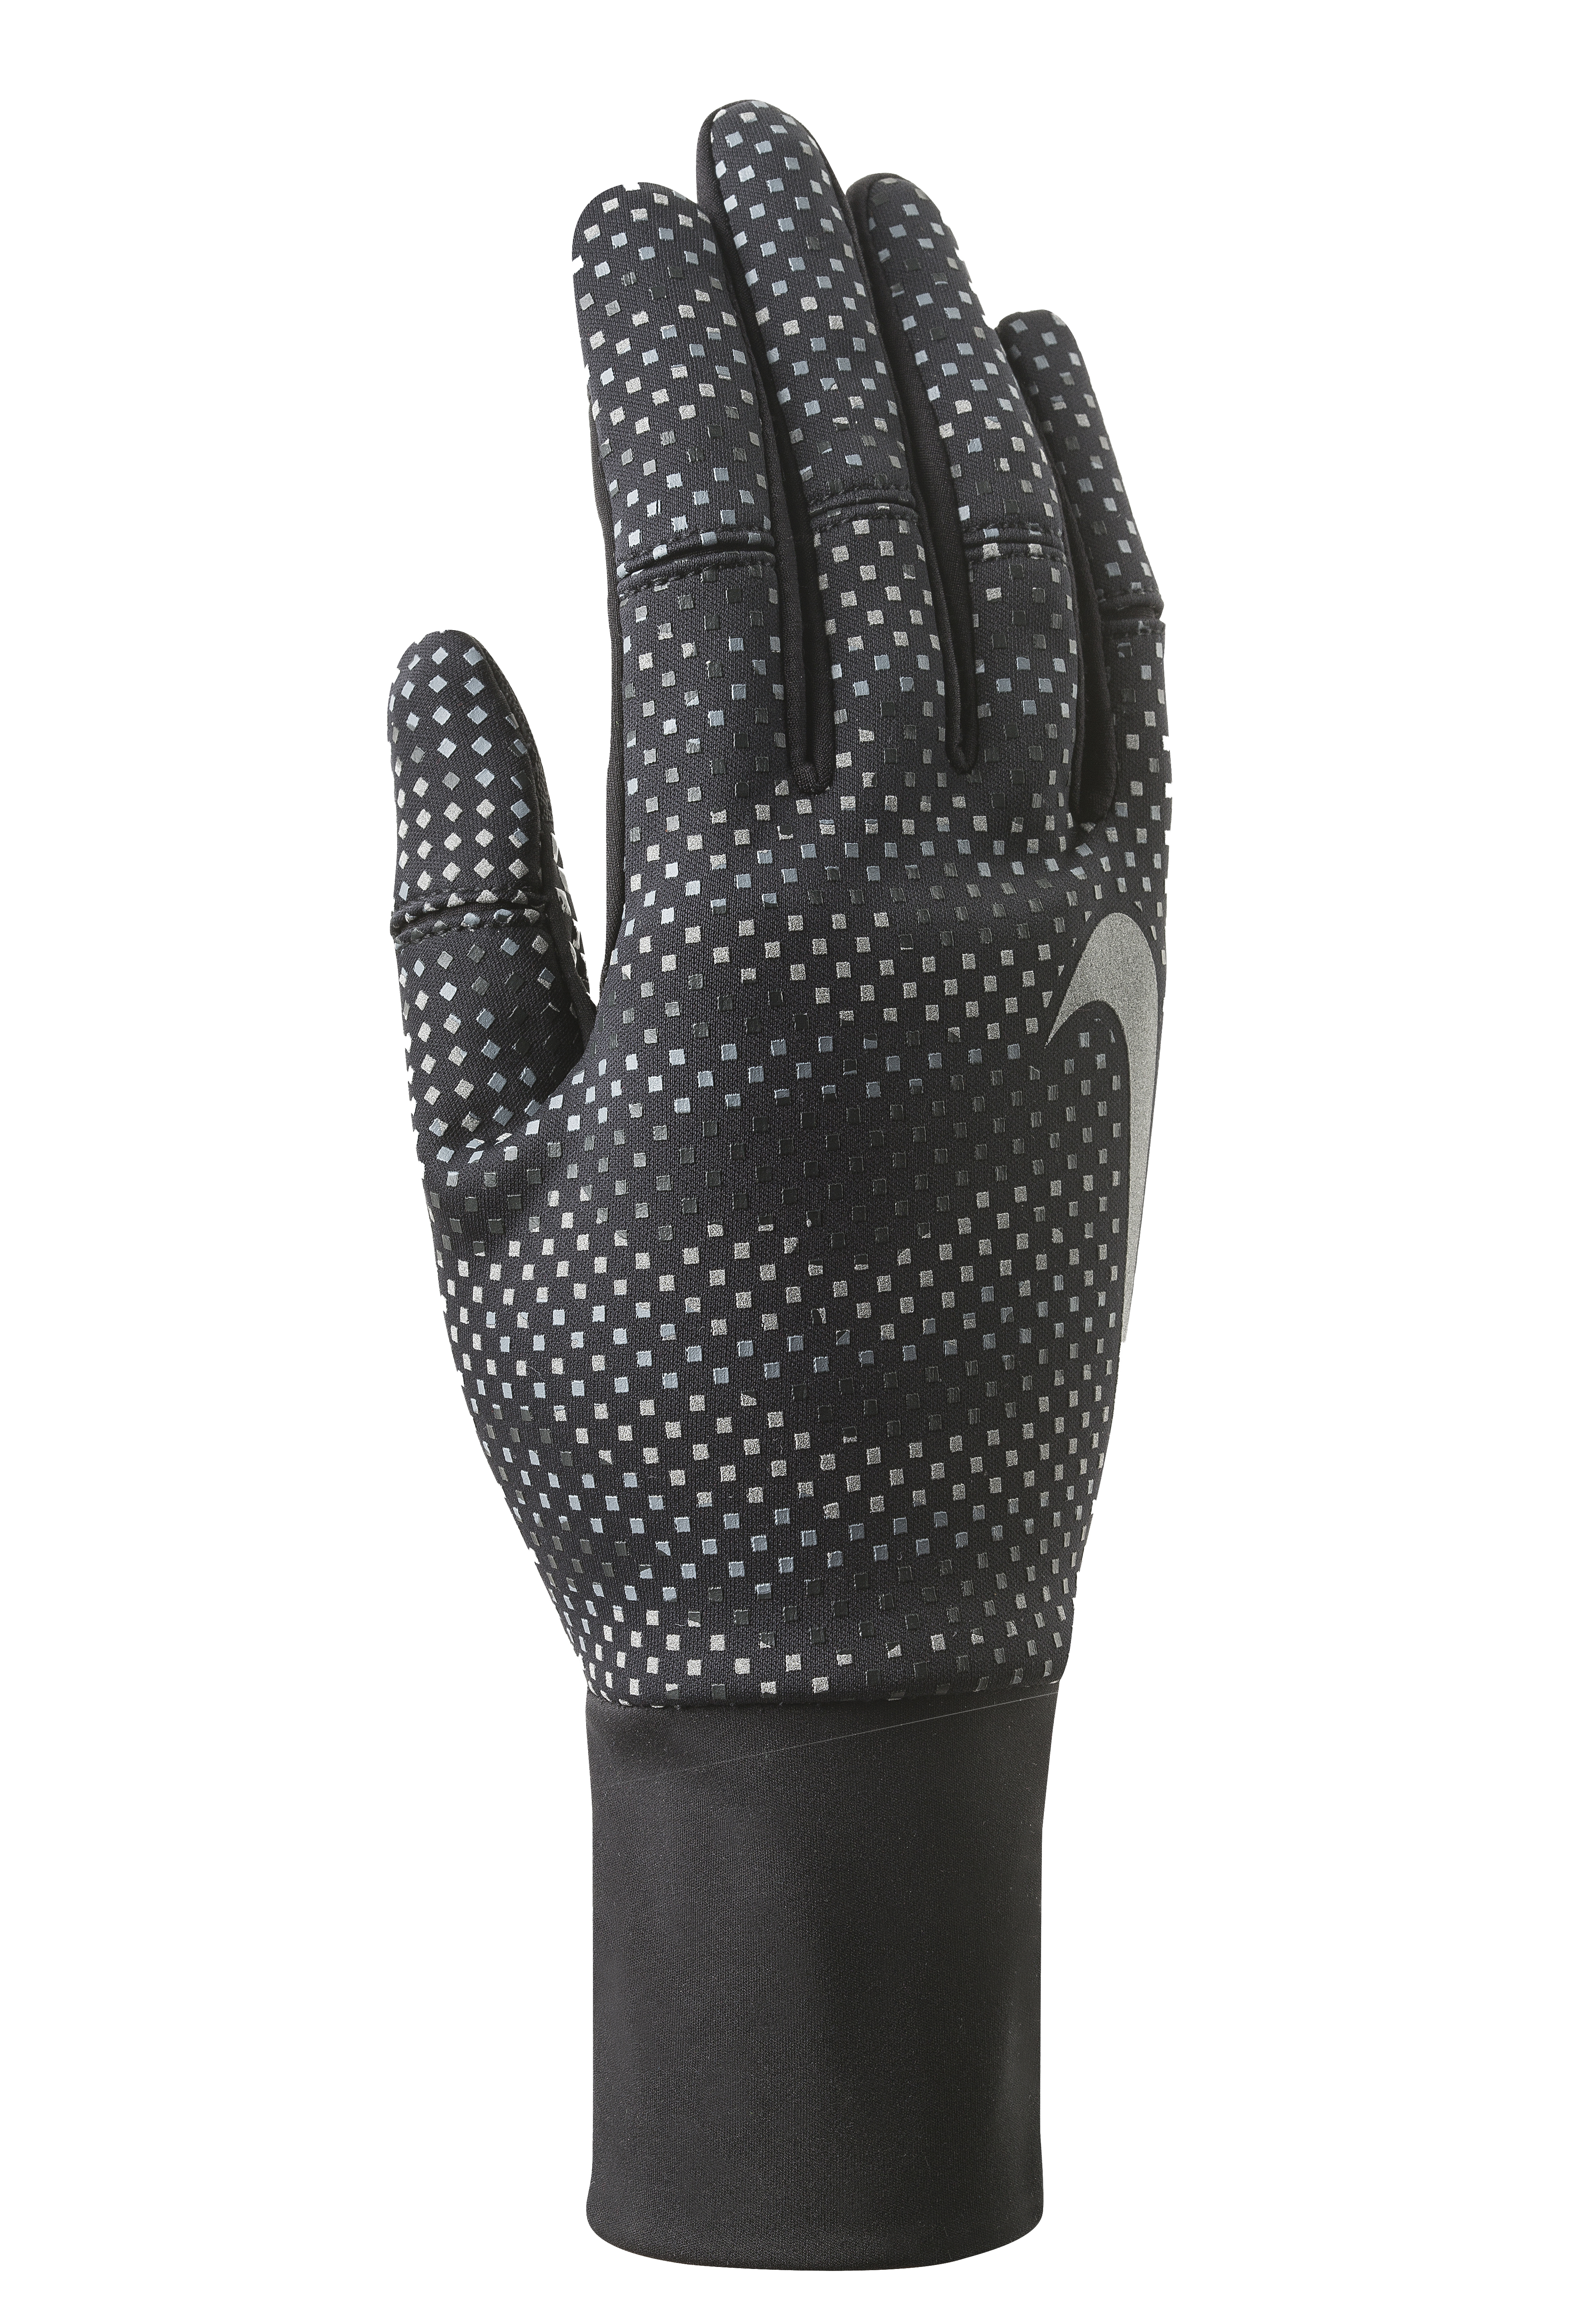 Nike Vapor Flash 2.0 Run Gloves - Women s 55a85c76a